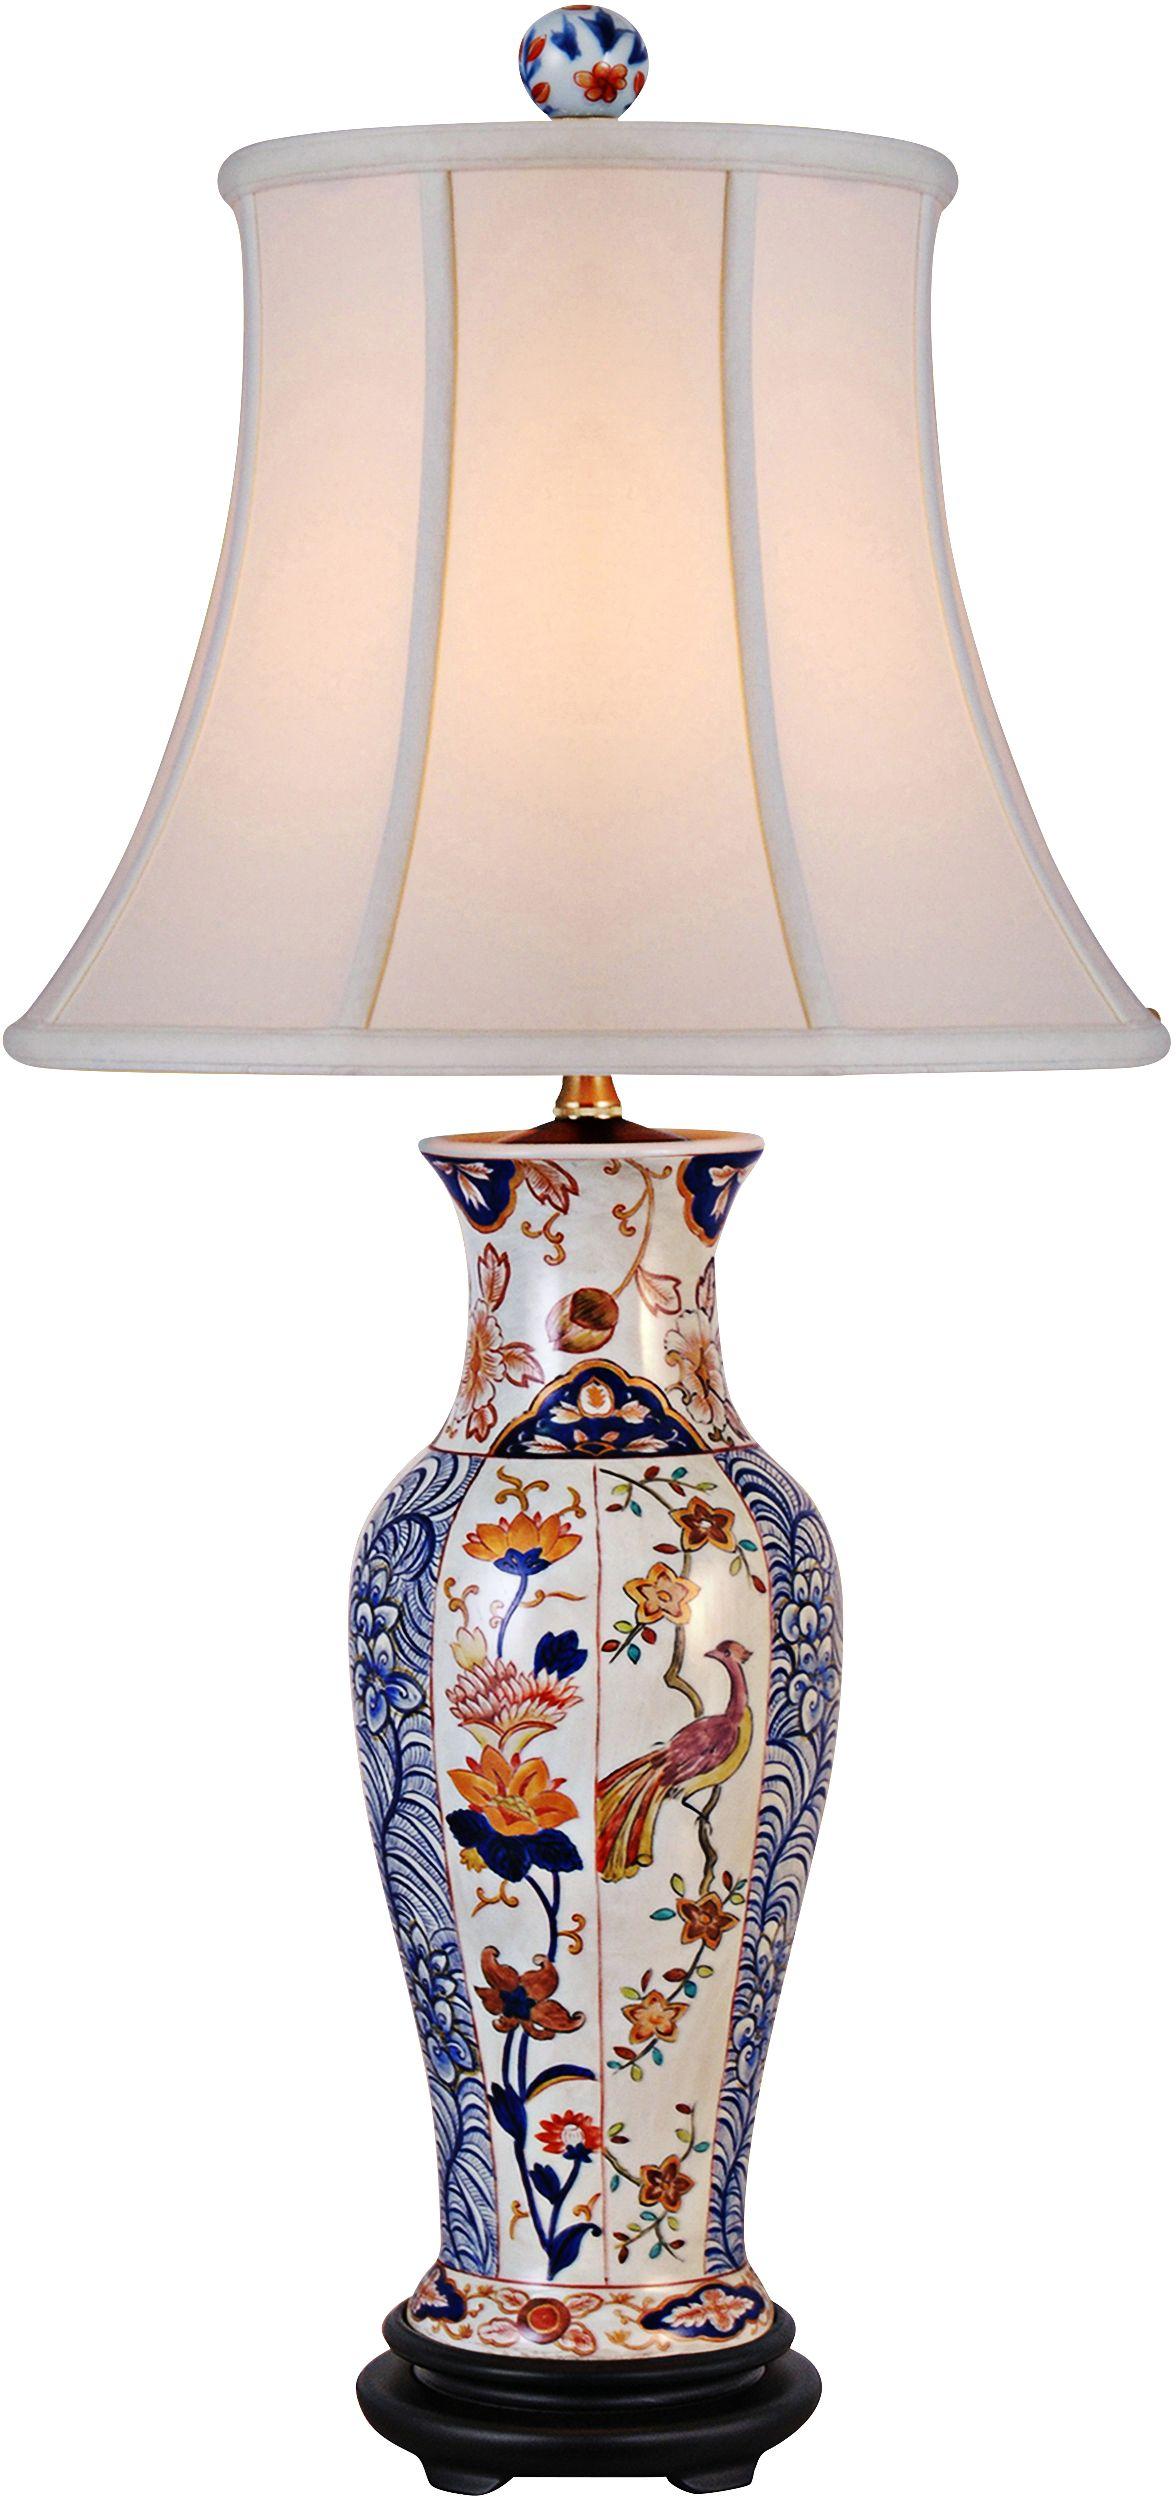 Elliana Multicolor Porcelain Table Lamp